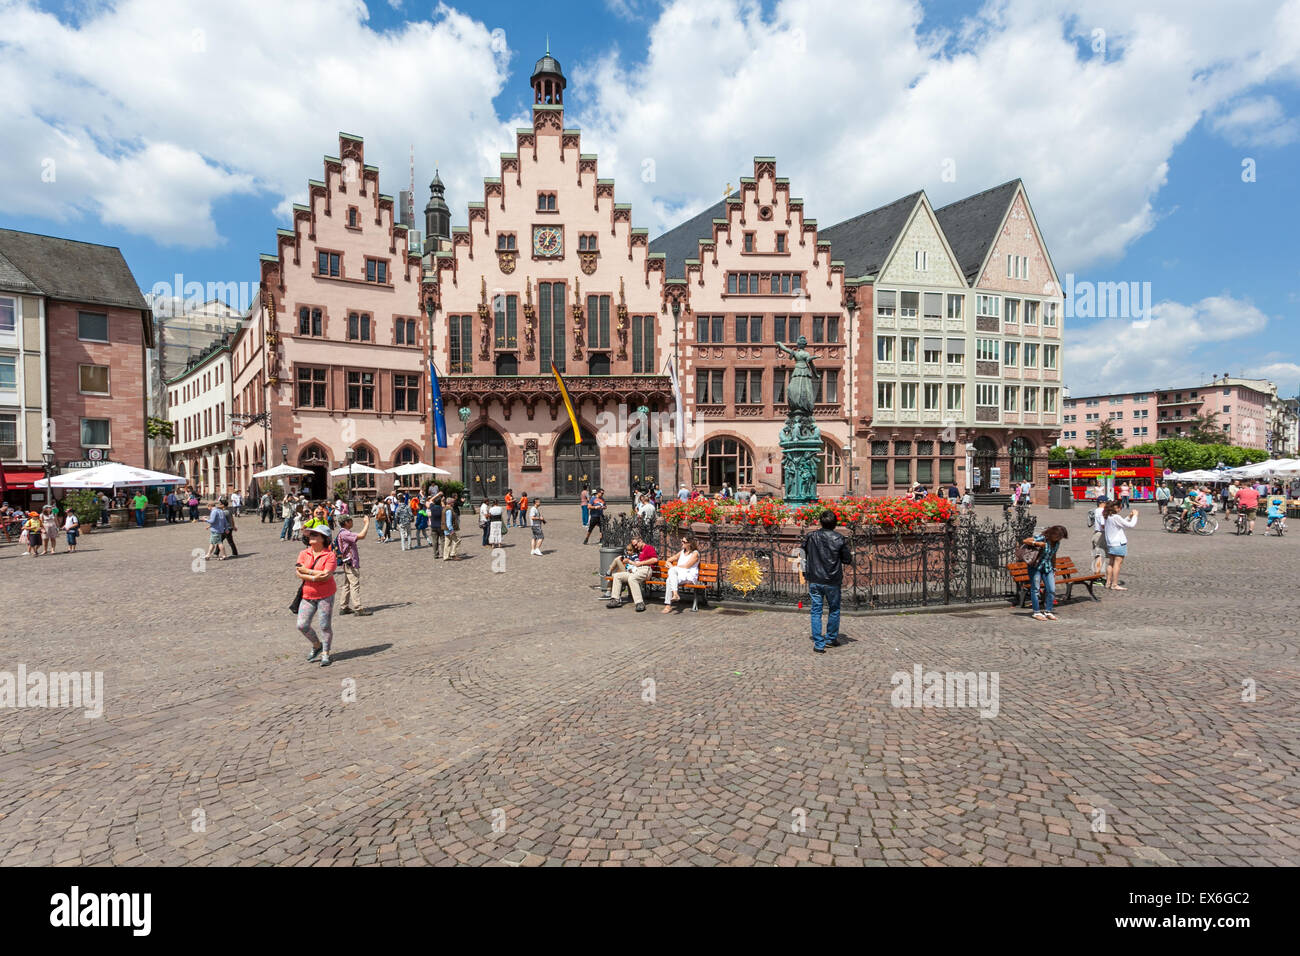 Historic Roemberberg square in the city of Frankfurt Main, Germany Stock Photo